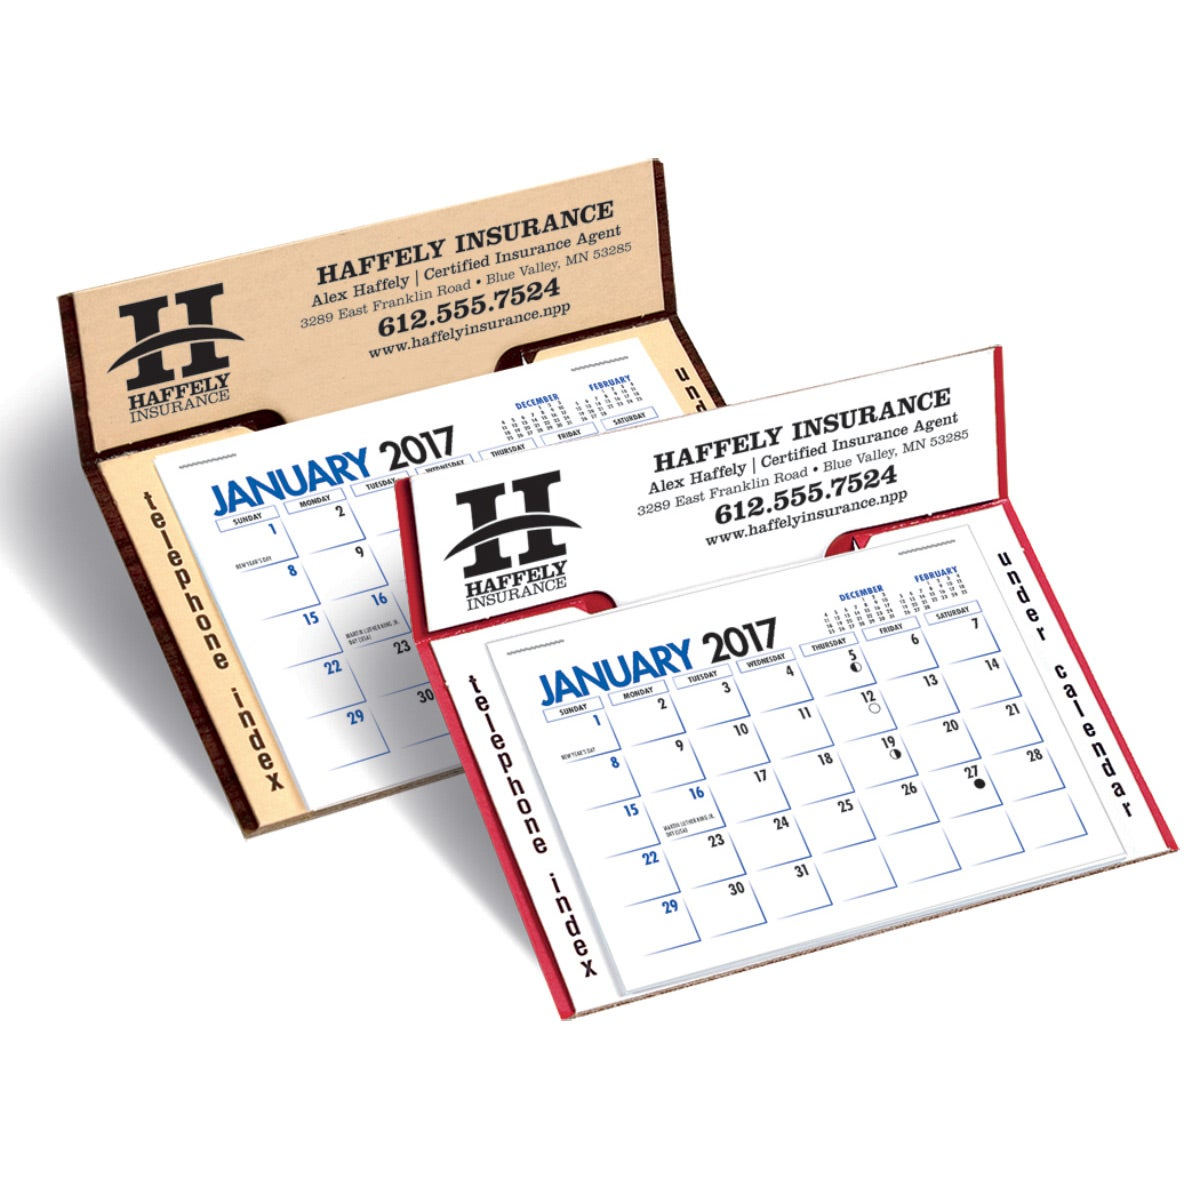 Memo Desk Calendar (2017)  Custom Desktop Items  143 Ea. Desk No Drawers. Classroom Desk Name Plates. Table Hinge. Folding School Desk. Contemporary Dining Tables. Hospital Bed Table. Ikea Standup Desk. 10 Seater Dining Table